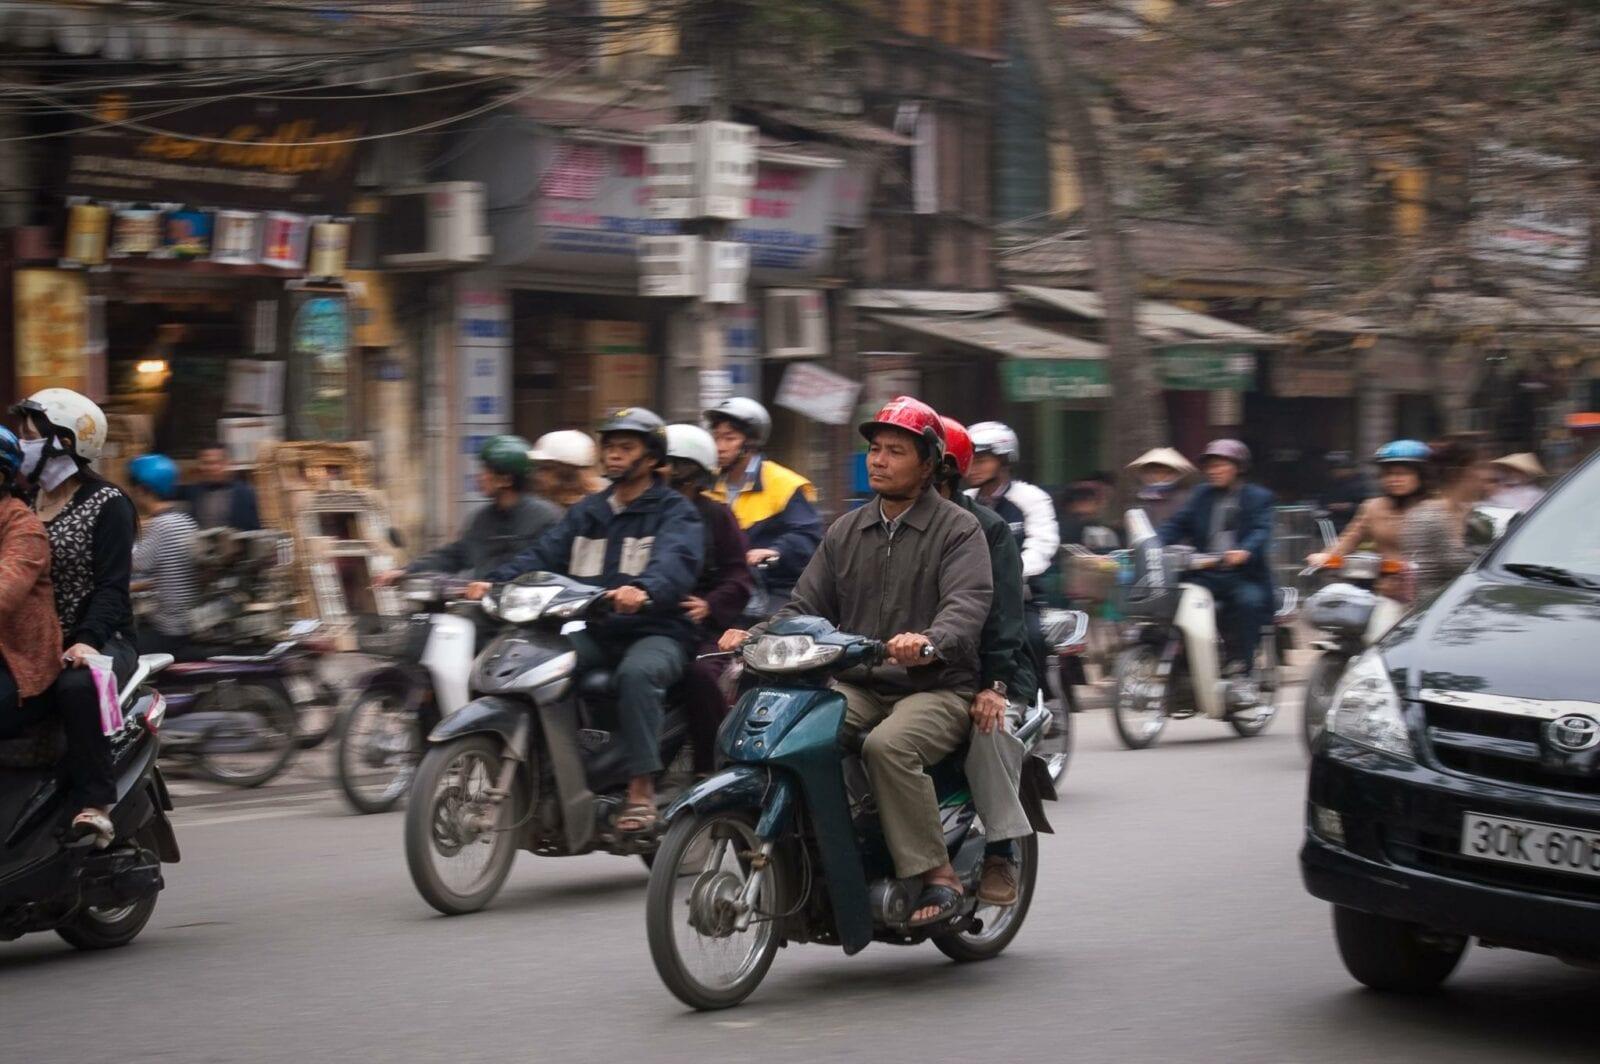 Image of the motorbike and car traffic in Hanoi, Vietnam